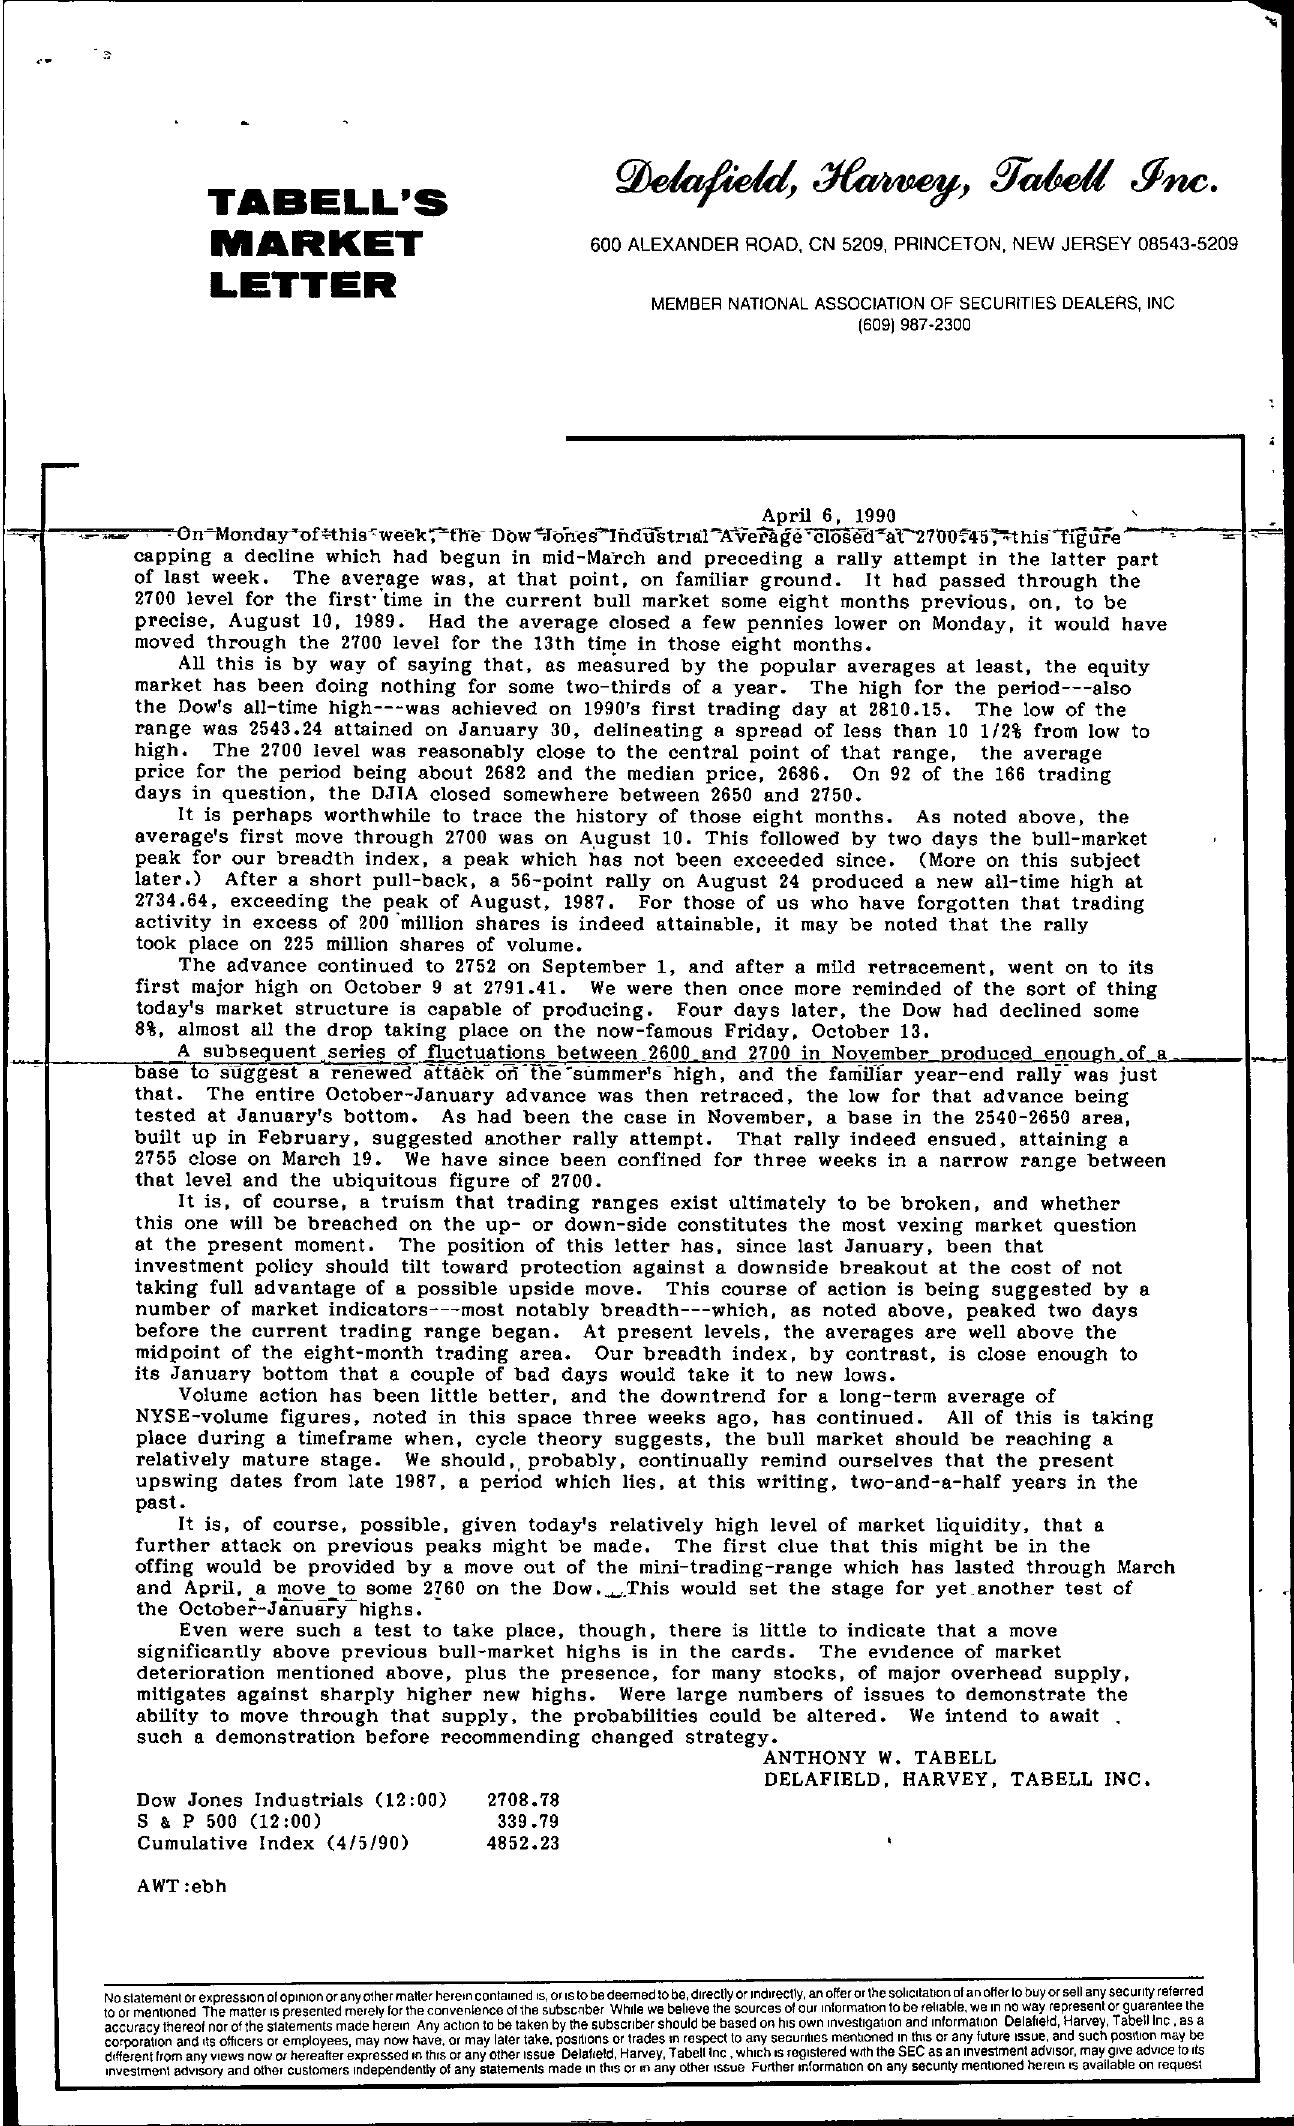 Tabell's Market Letter - April 06, 1990